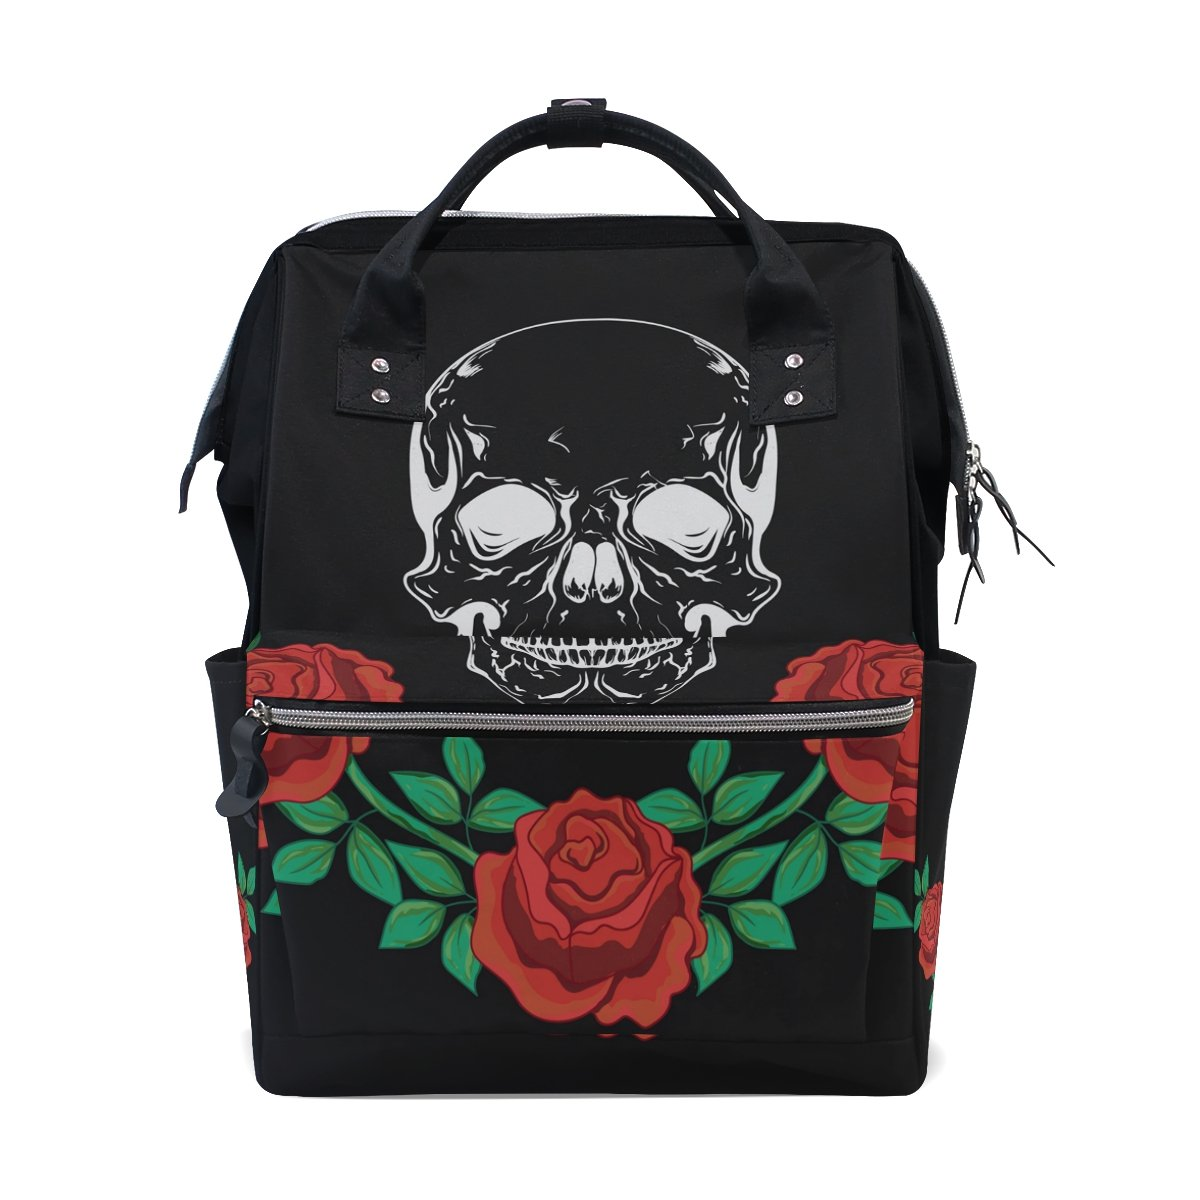 JSTeLノートパソコンカレッジバッグ学生旅行Skull and Roses 909学校バックパックショルダートートバッグ B078MYQFMN